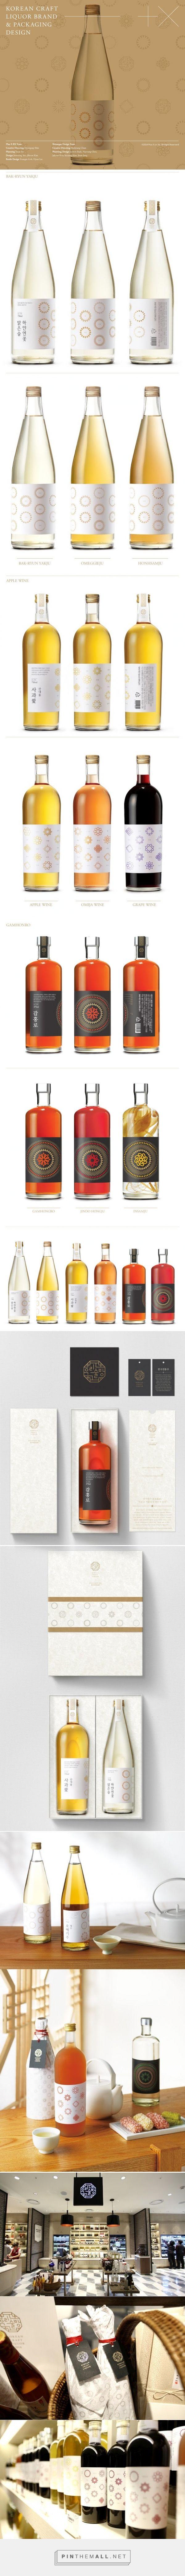 Shinsegae Traditional #Liquor #packaging designed by Plus X & Shinsaegae design team - http://www.packagingoftheworld.com/2015/03/shinsegae-traditional-liquor.html